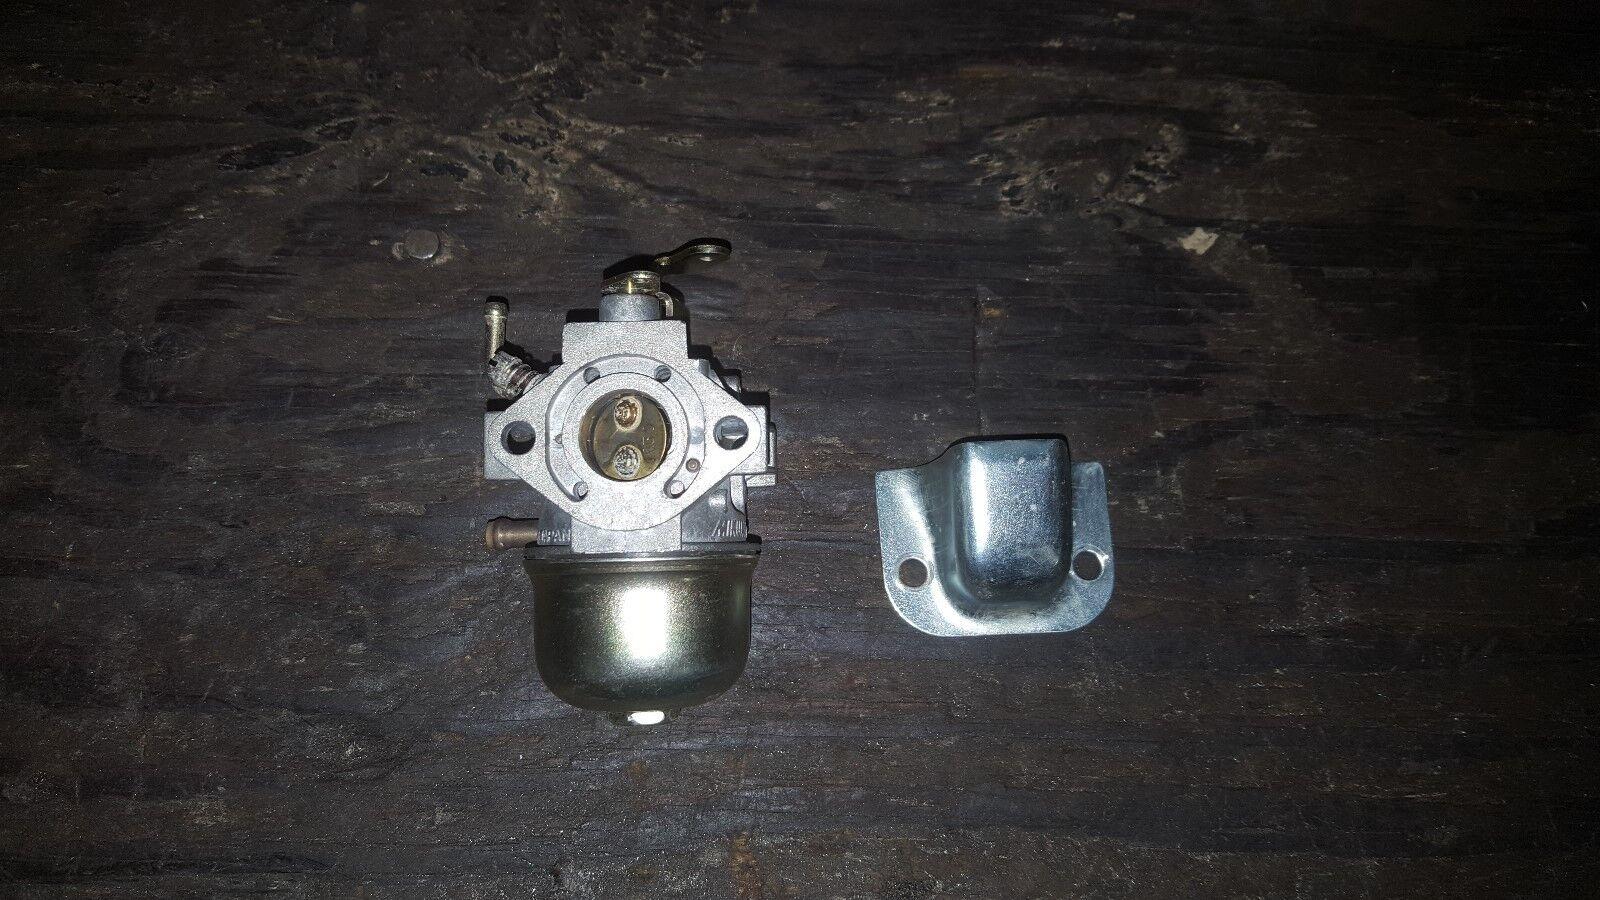 Toro CCR 2000 Soplador de NIEVE Cocheburador parte  95-7935 Usado